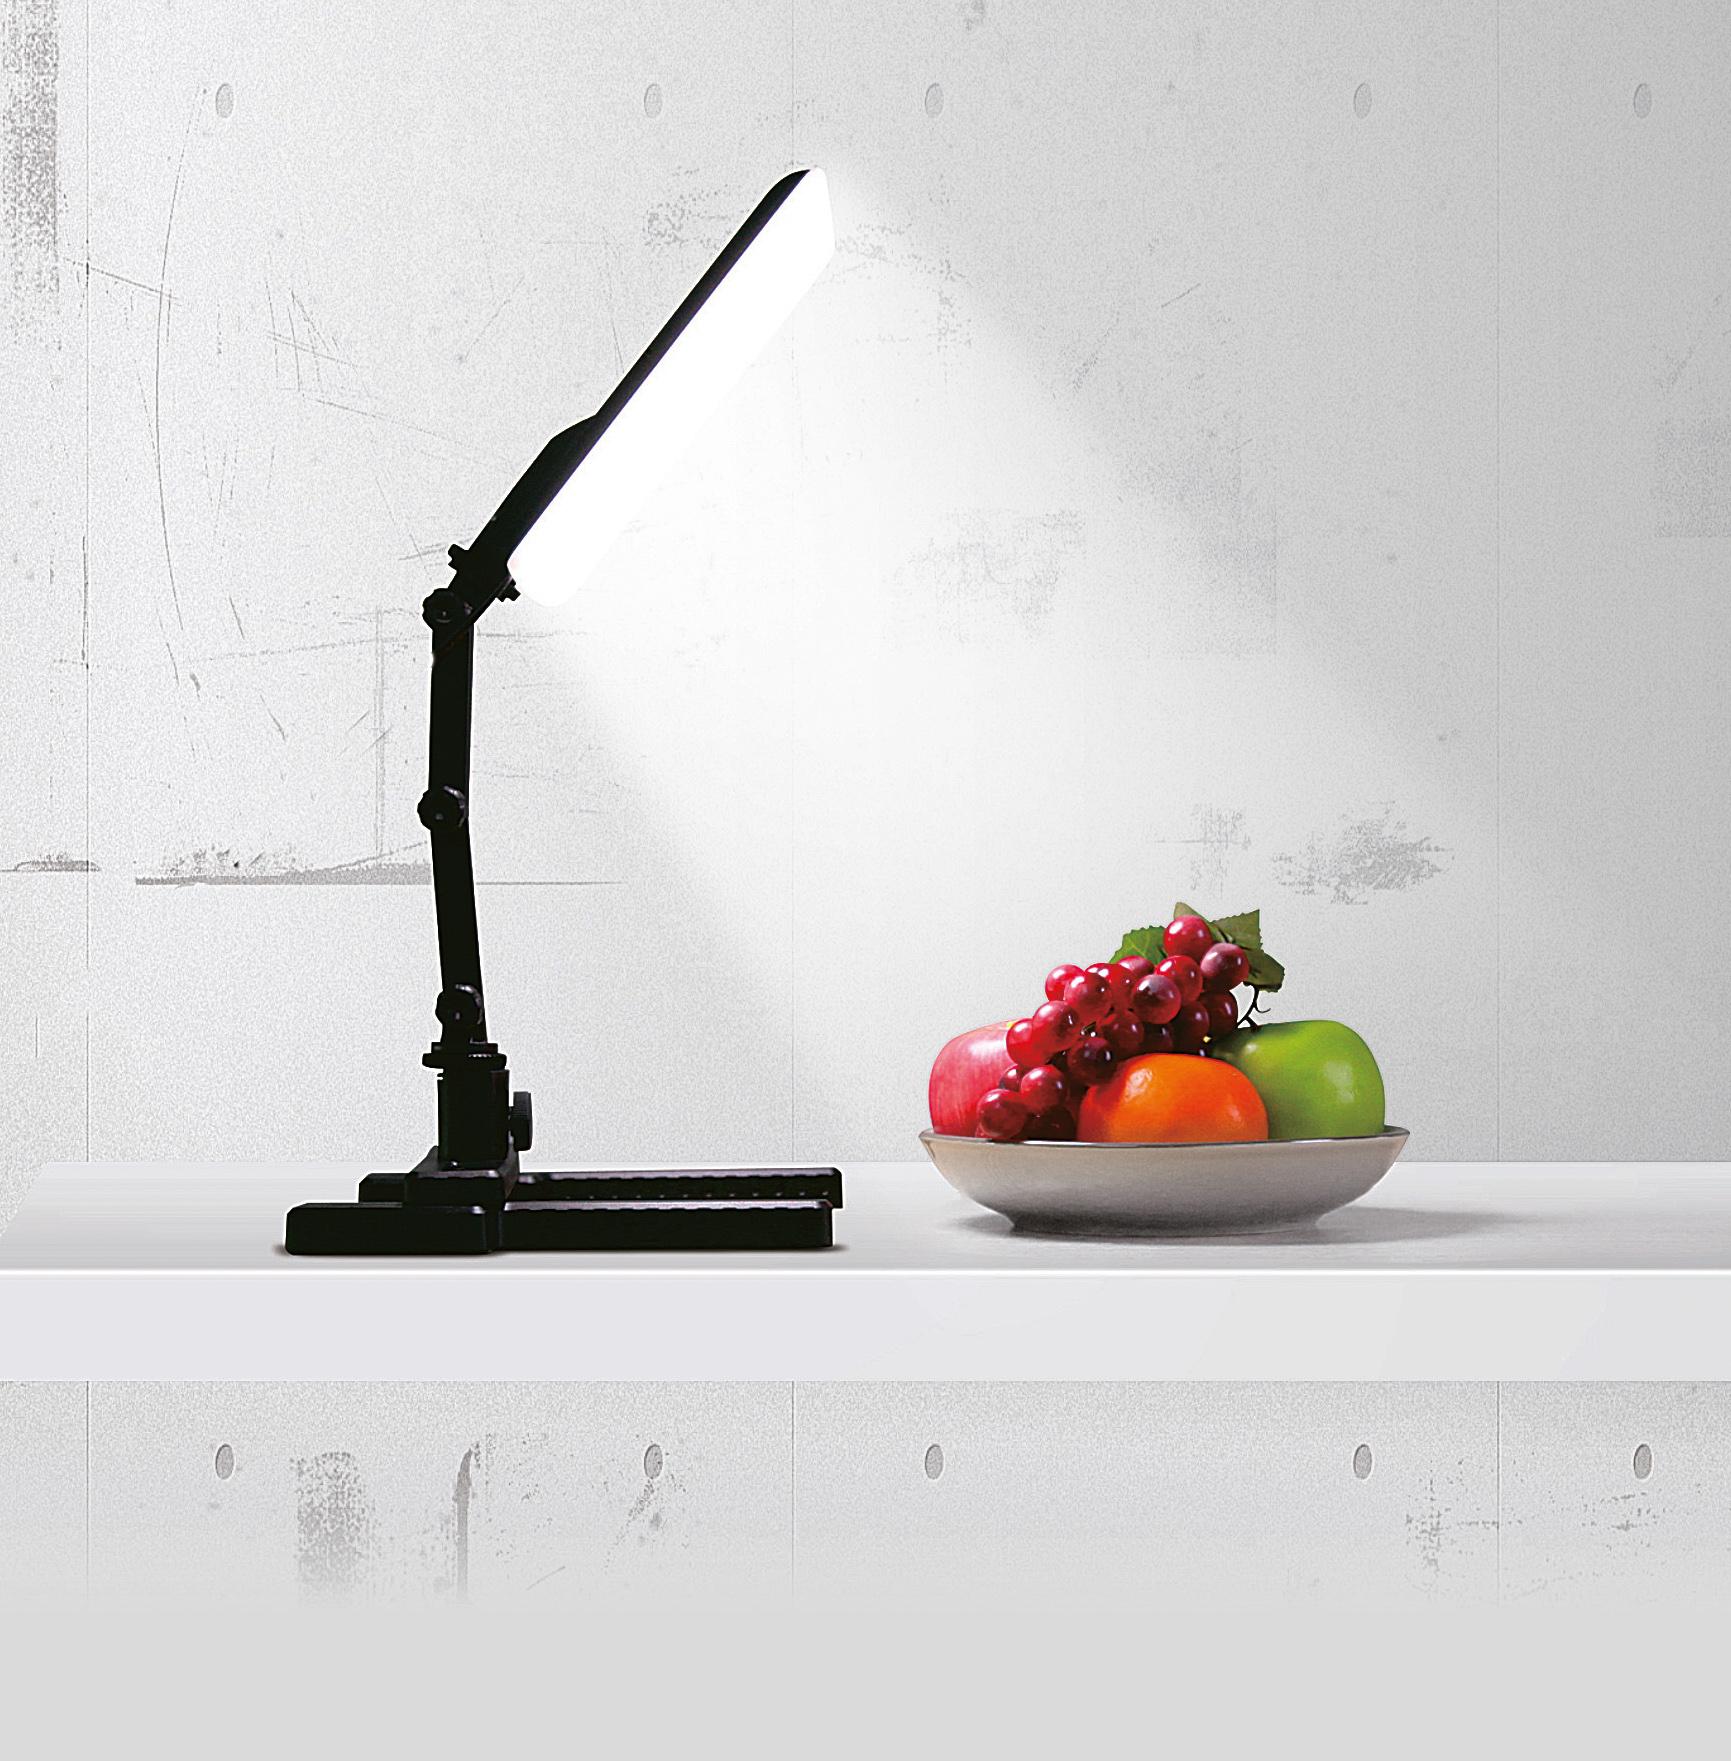 KAISER Desktop-Leuchte LED, 5600K, Leuchtfläche 14x20cm